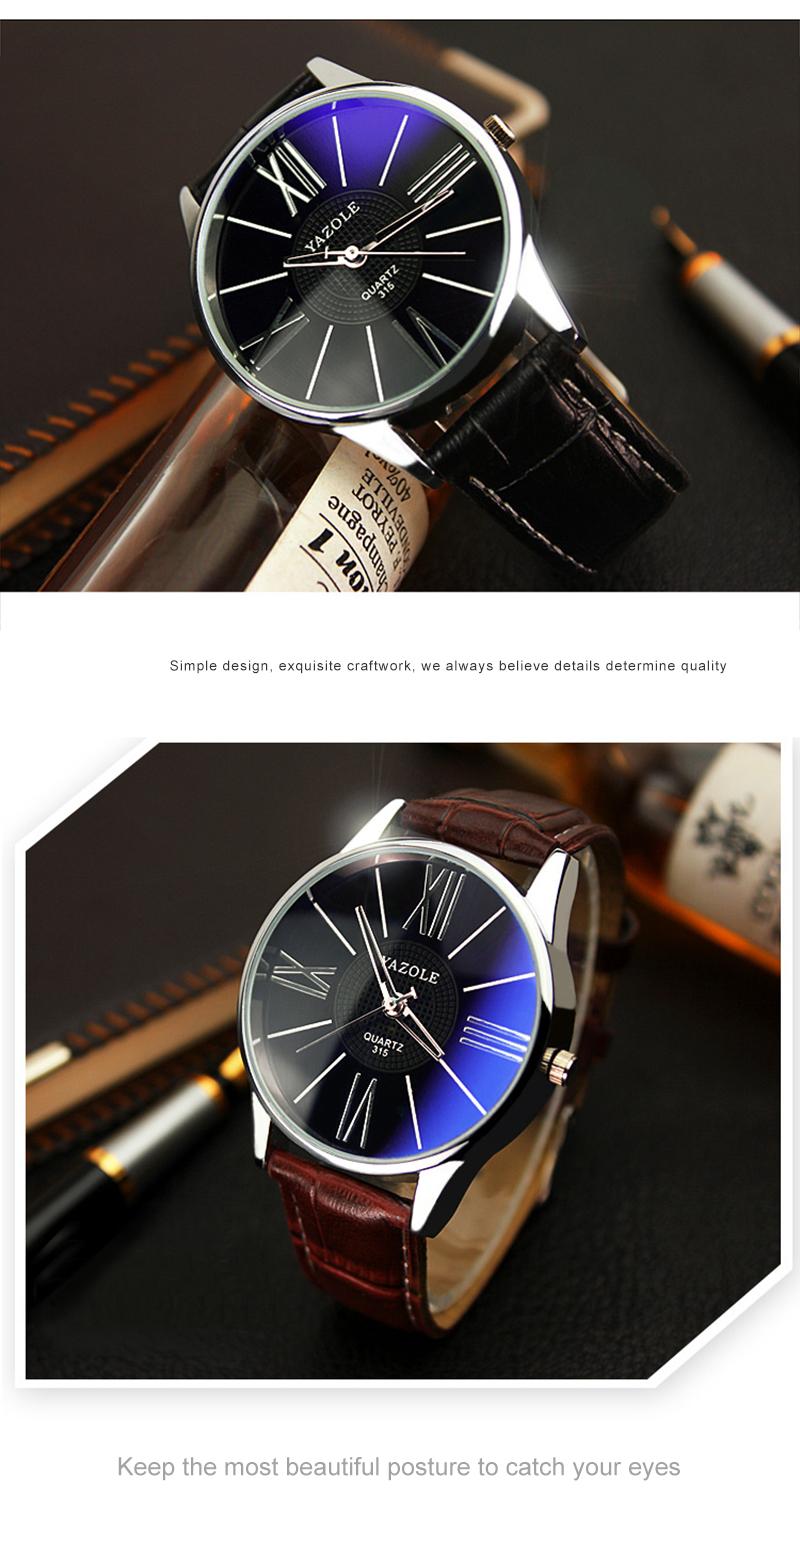 HTB1EL 2SpXXXXcRaXXXq6xXFXXXO - Mens Watches Top Brand Luxury 2018 Yazole Watch Men Fashion Business Quartz-watch Minimalist Belt Male Watches Relogio Masculino